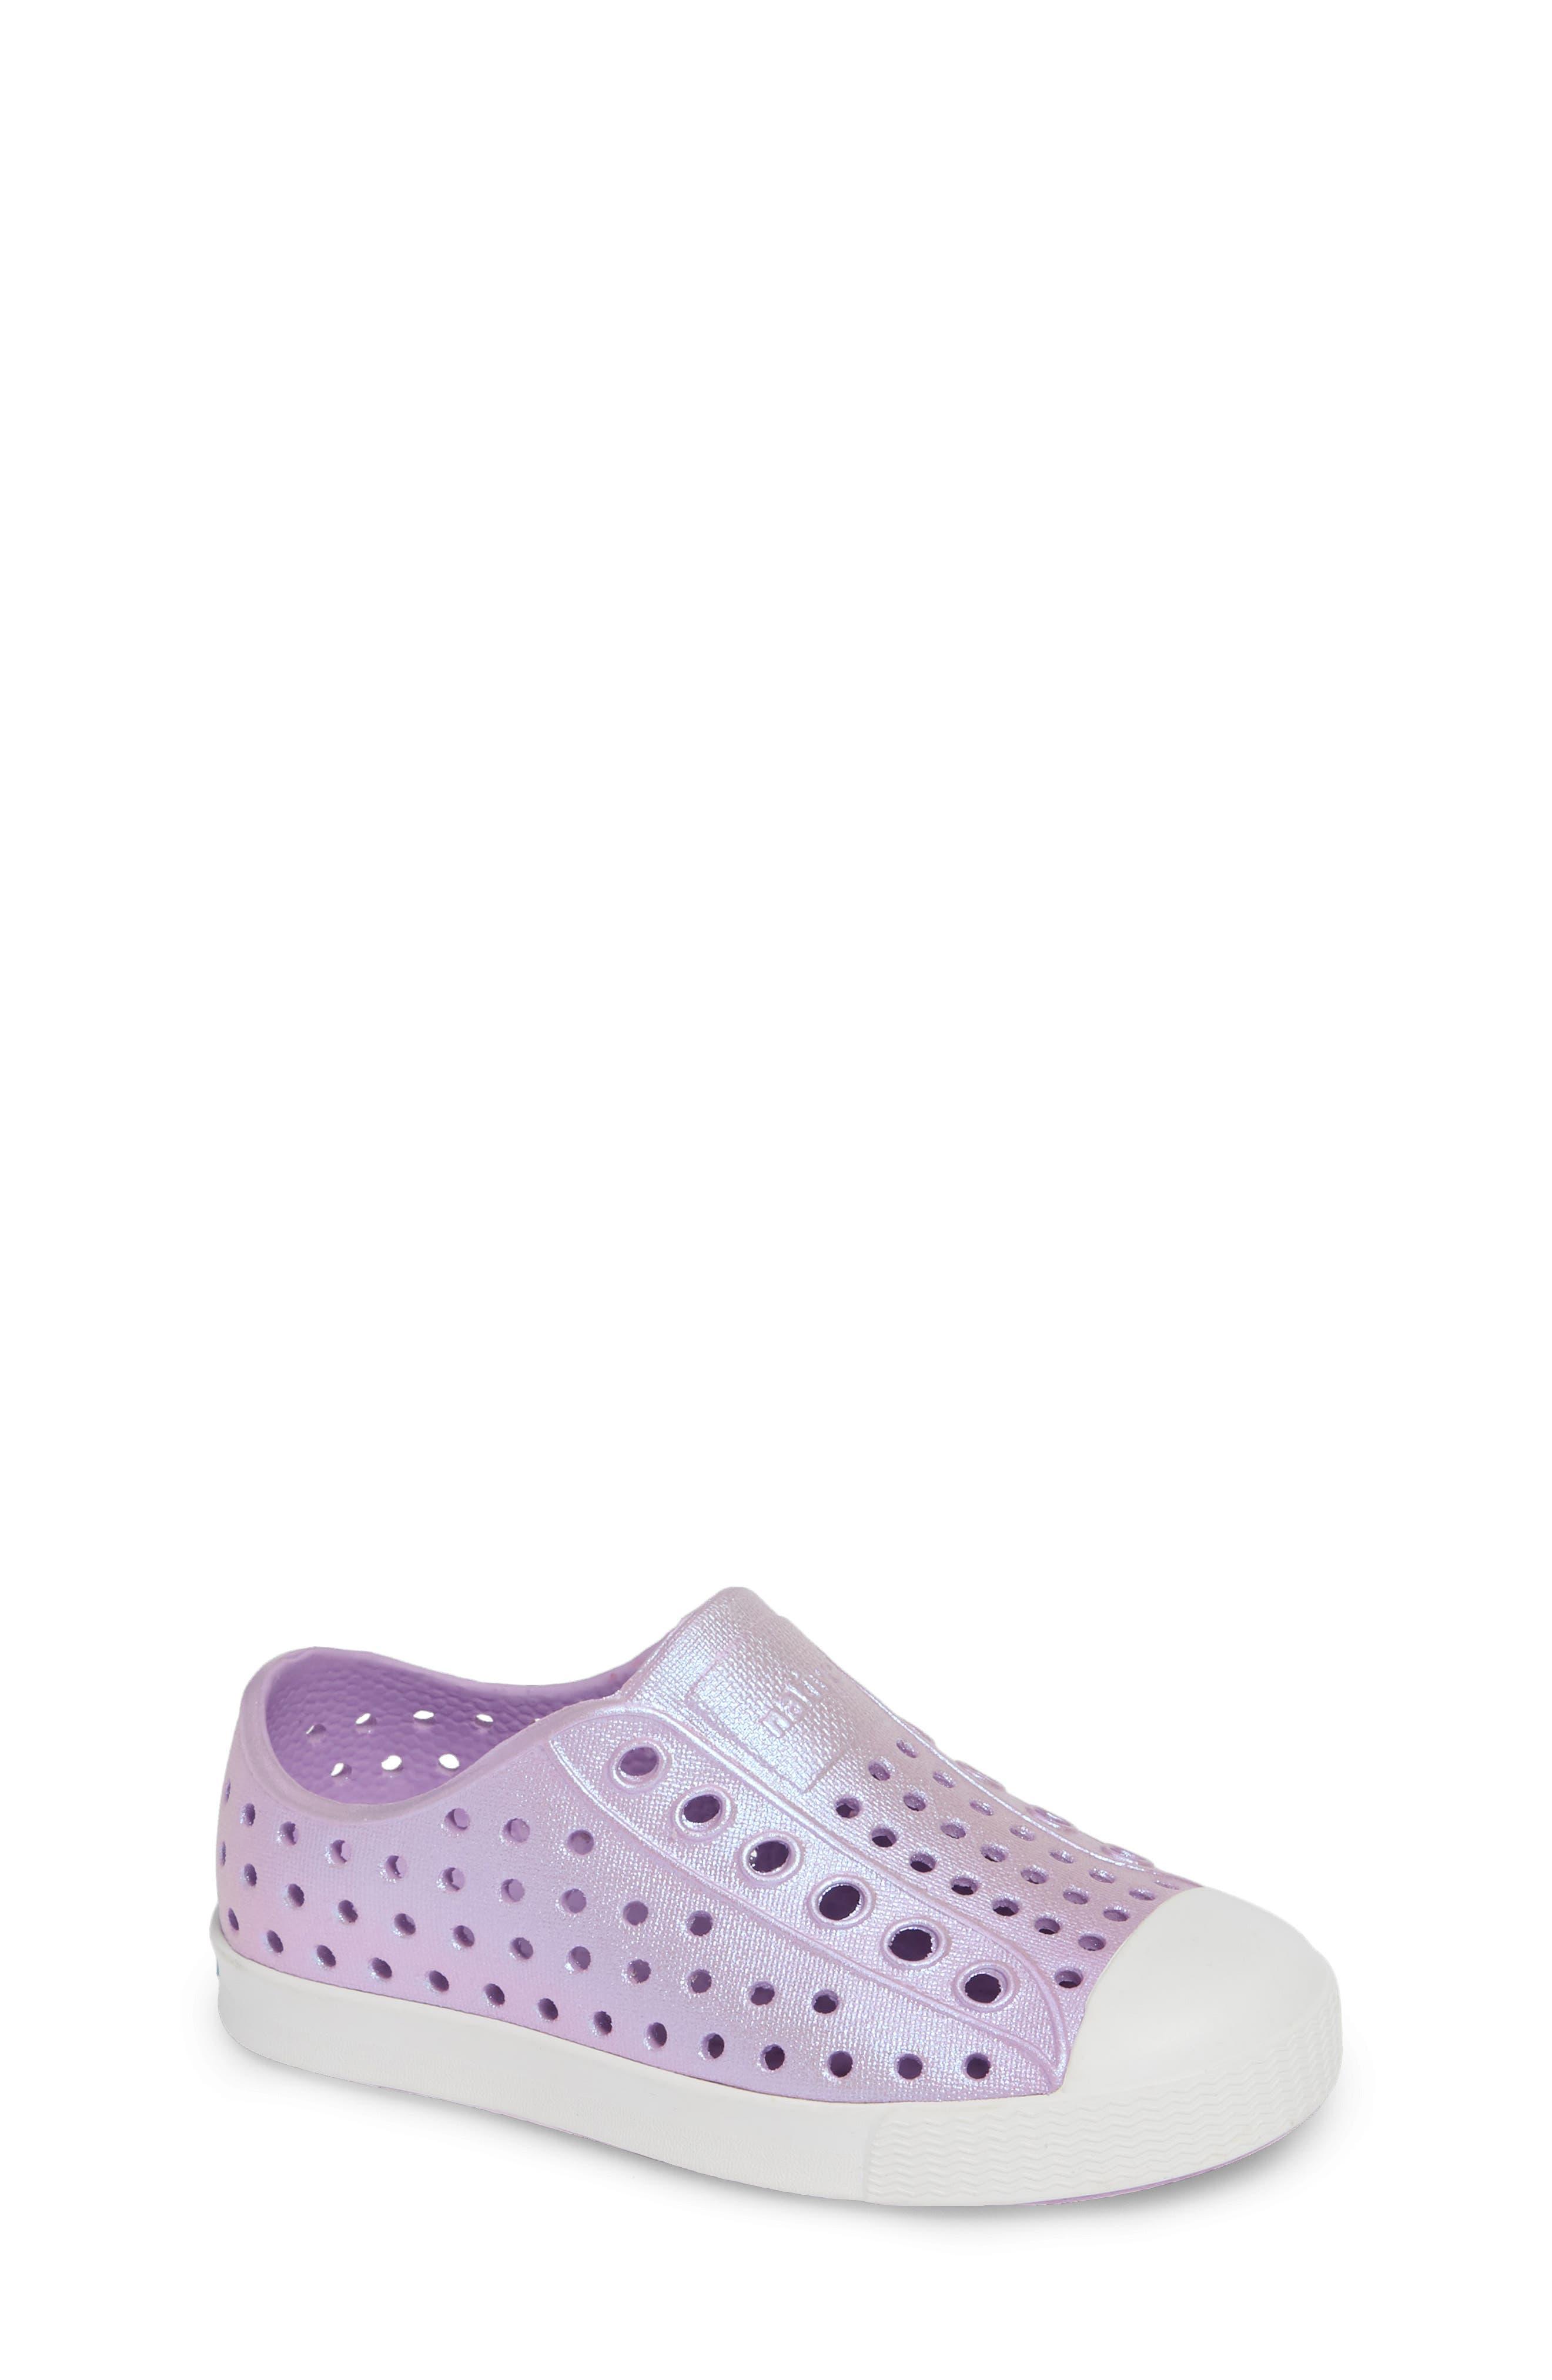 Jefferson Iridescent Slip-On Vegan Sneaker,                             Main thumbnail 1, color,                             LAVENDER/ SHELL WHITE/ GALAXY